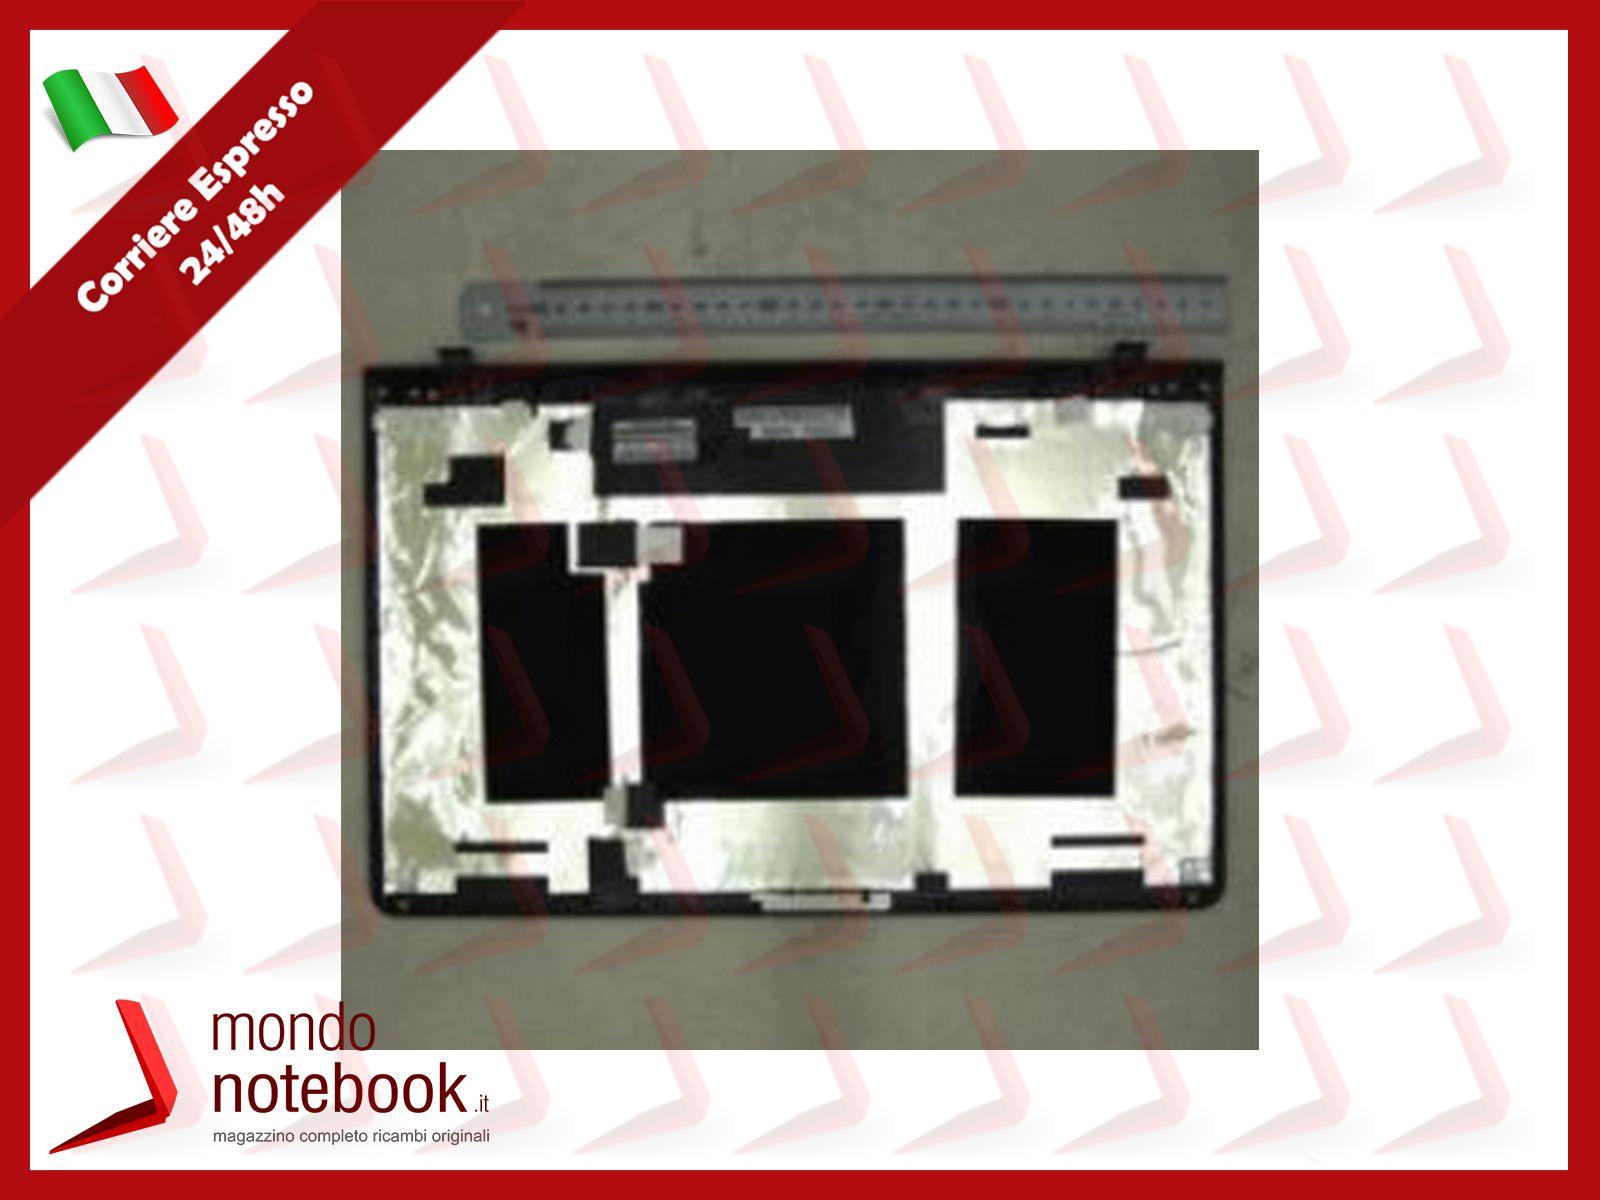 https://www.mondonotebook.it/11676/ventola-fan-cpu-hp-elitebook-8560w-8560p-versione-3-fori-vite.jpg